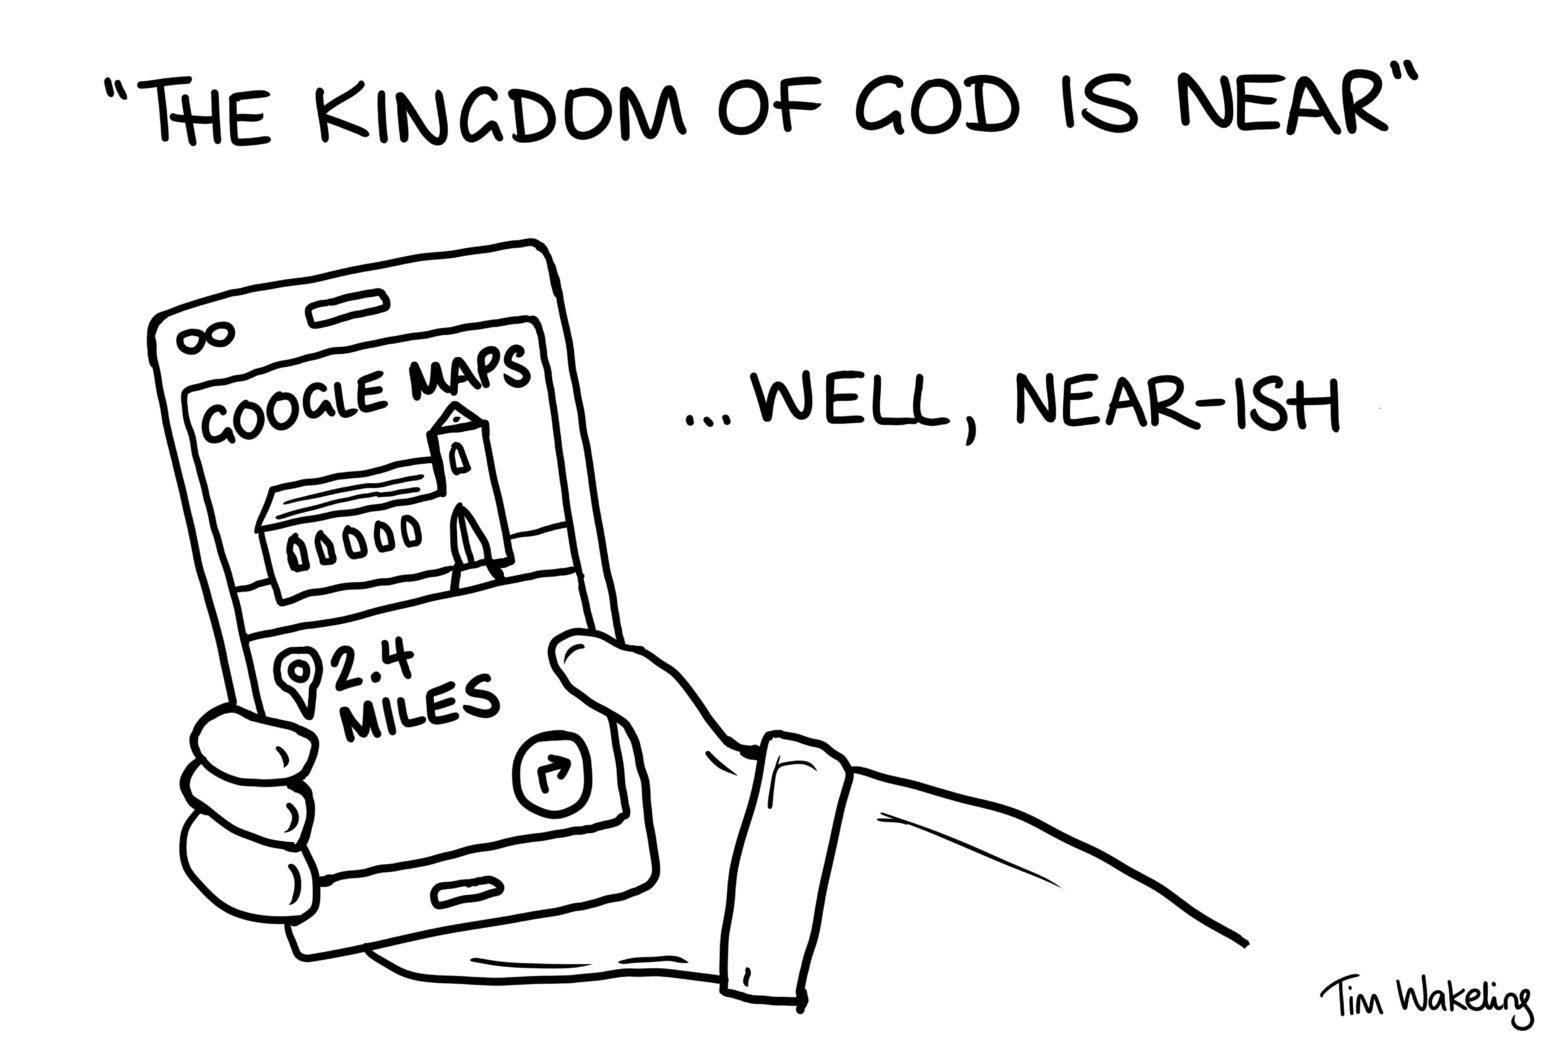 The Kingdom of God is near